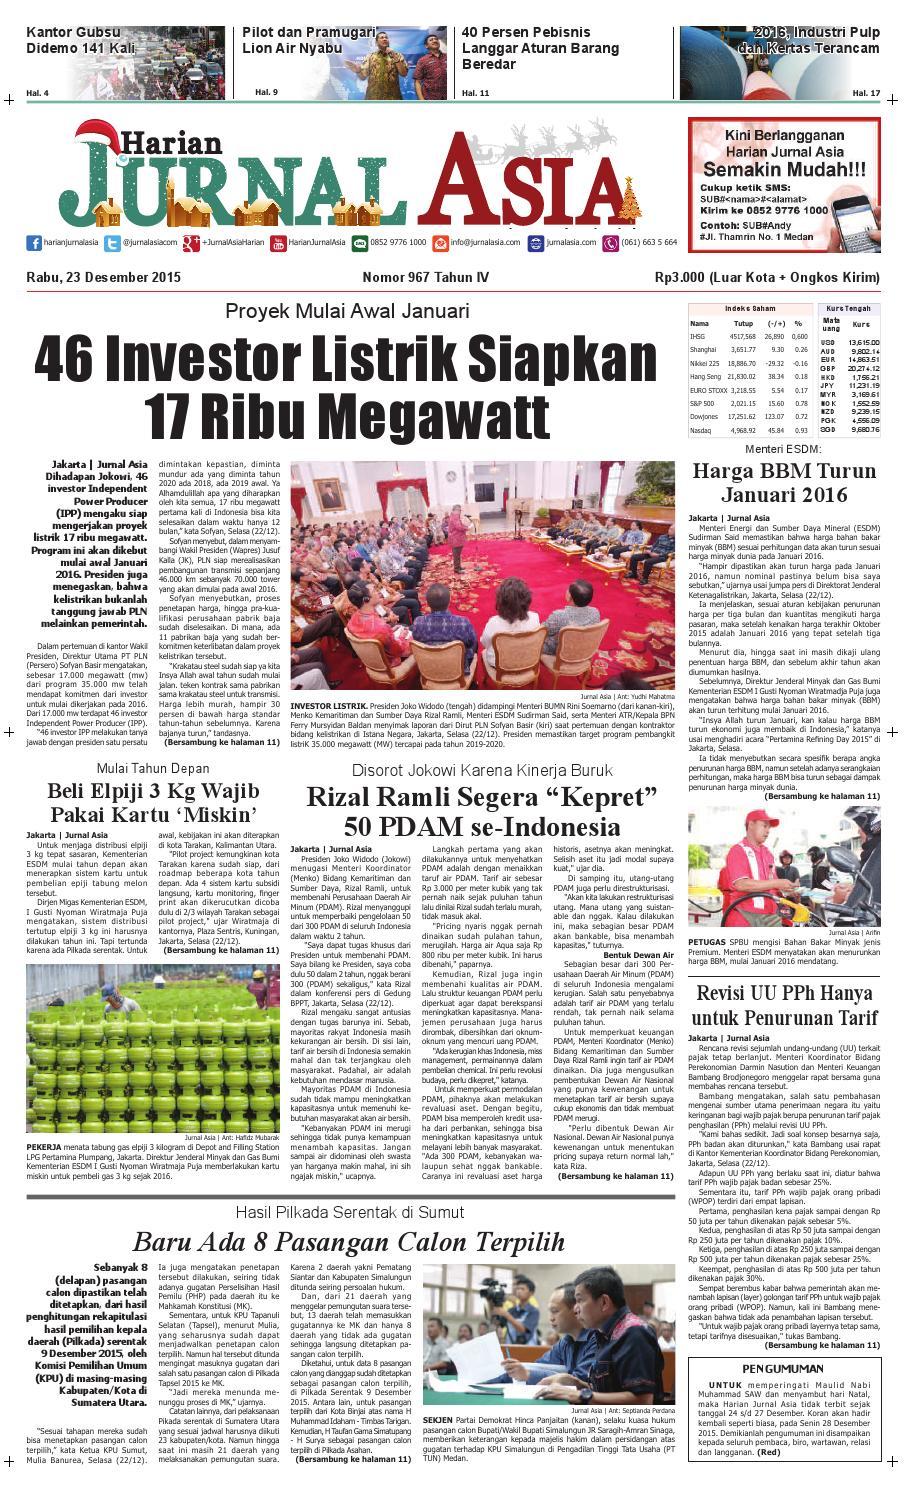 Harian Jurnal Asia Edisi Rabu 23 Desember 2015 By Harian Jurnal